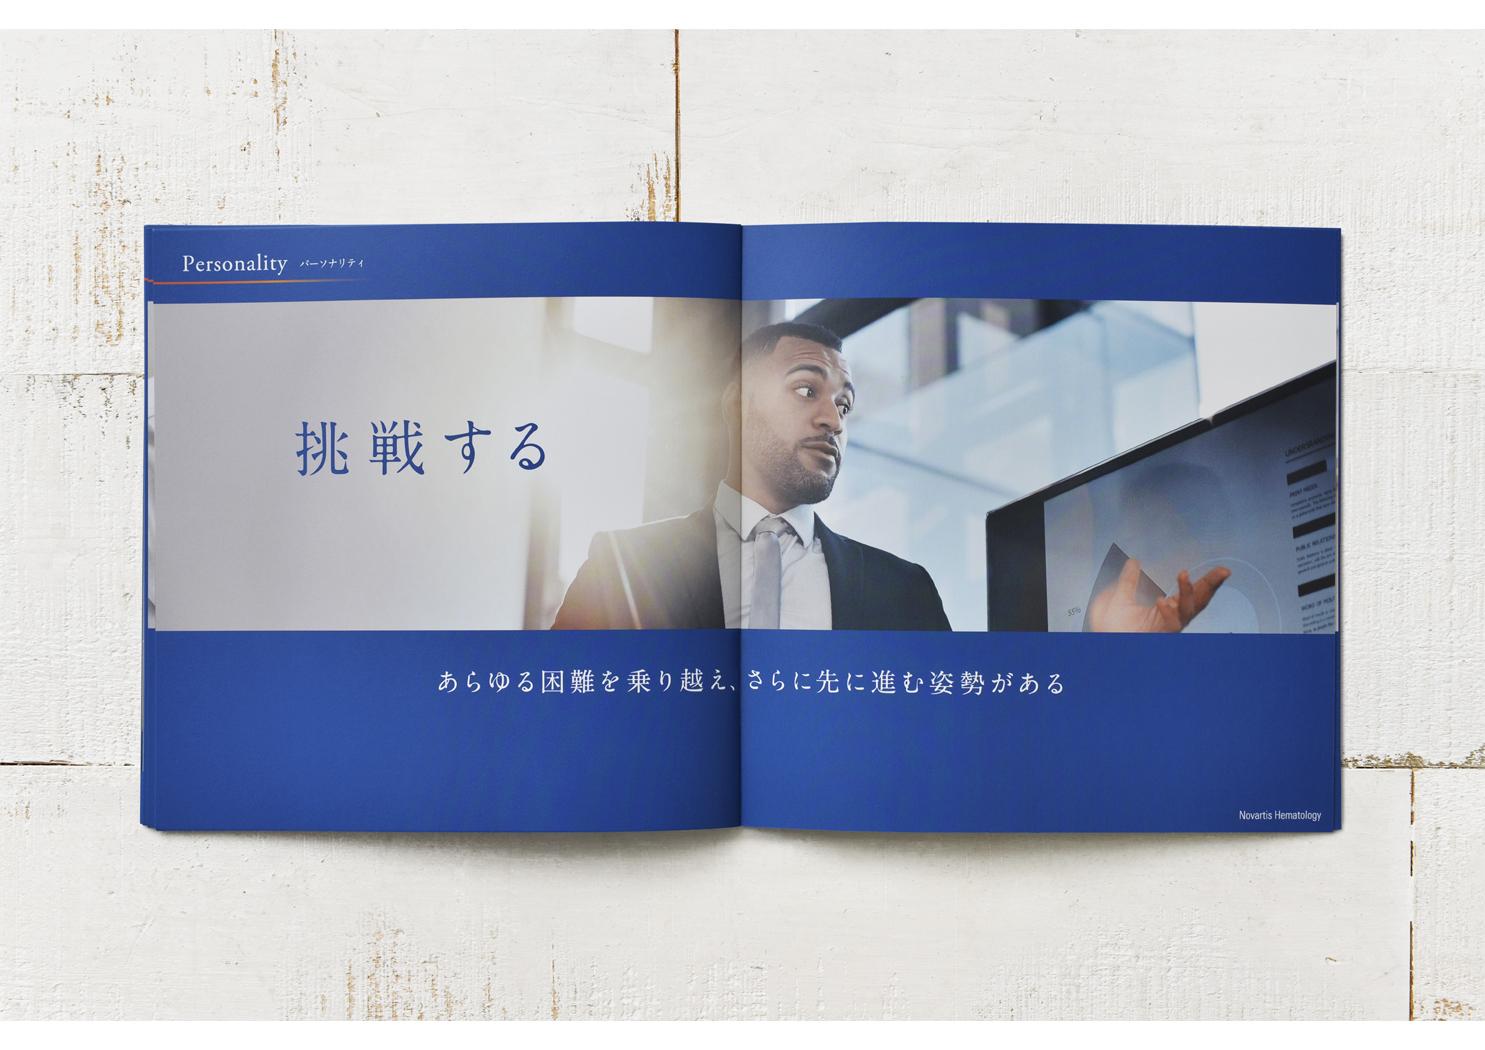 "NOVARTIS ""Novartis Hematology"" pamphlet"